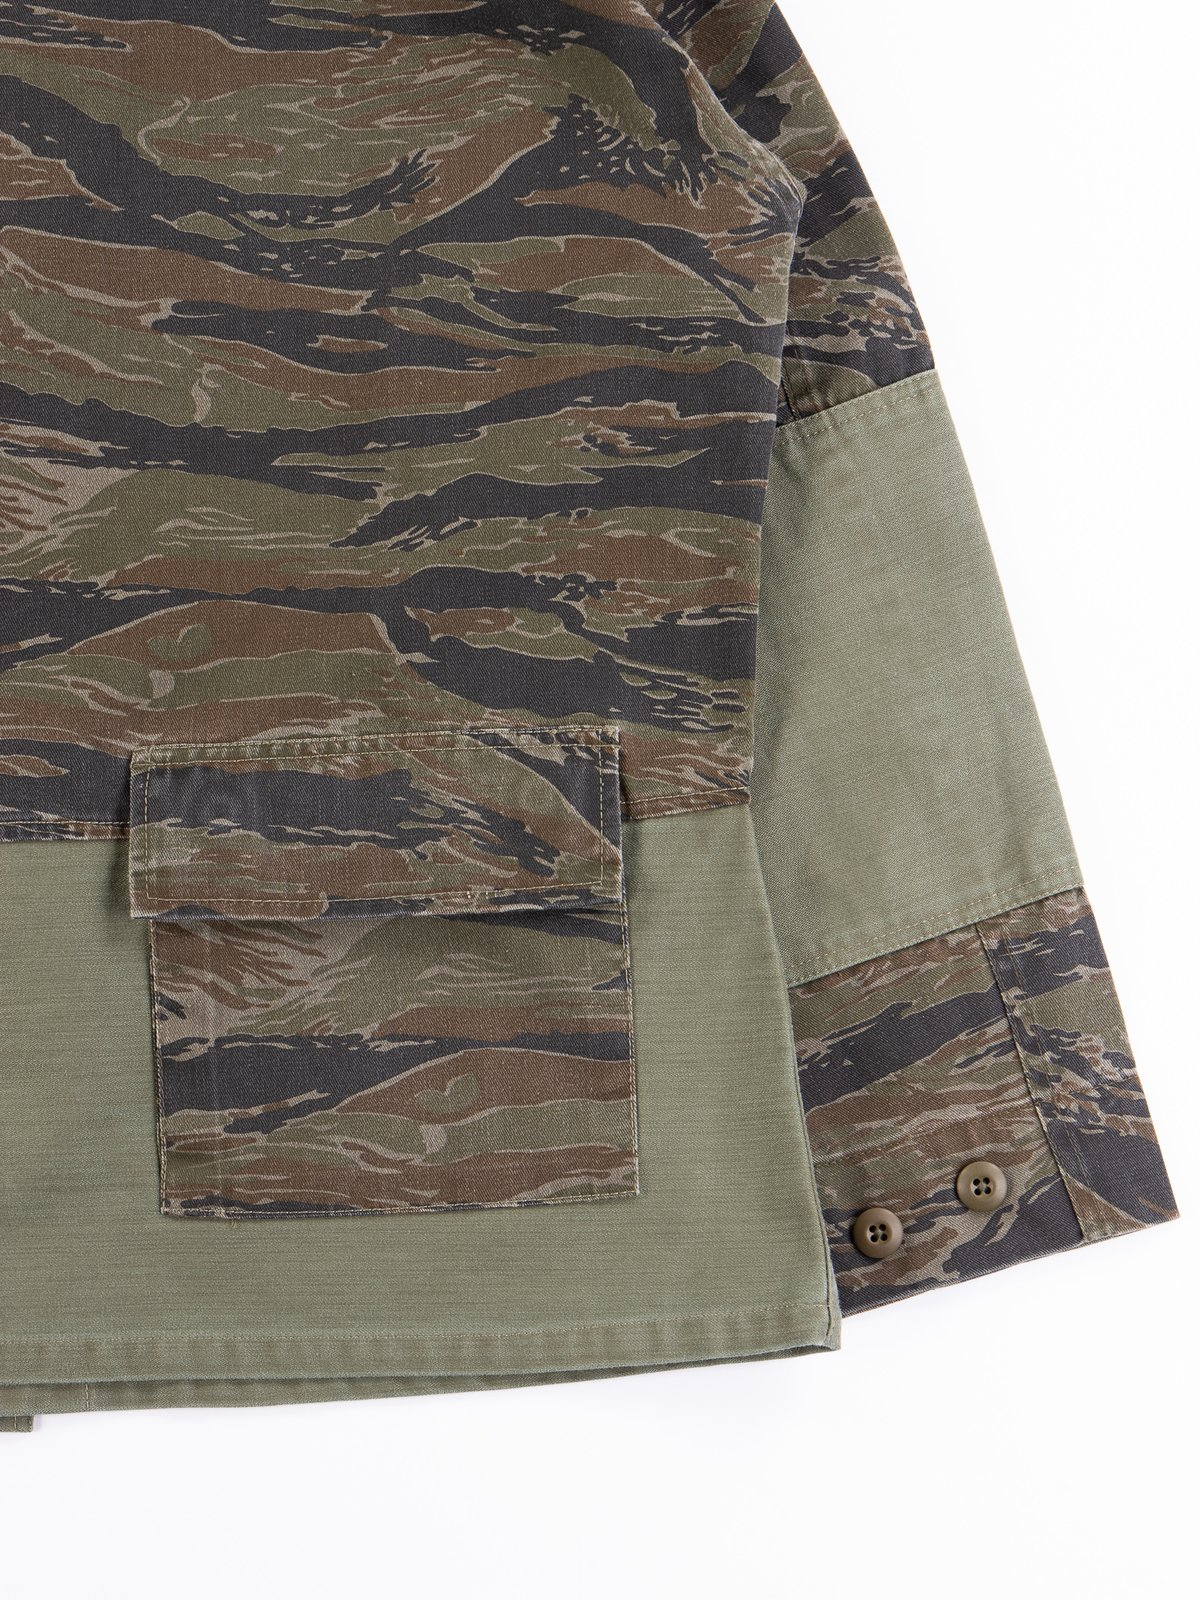 Reworks Camo/Olive Field Jacket - Image 7